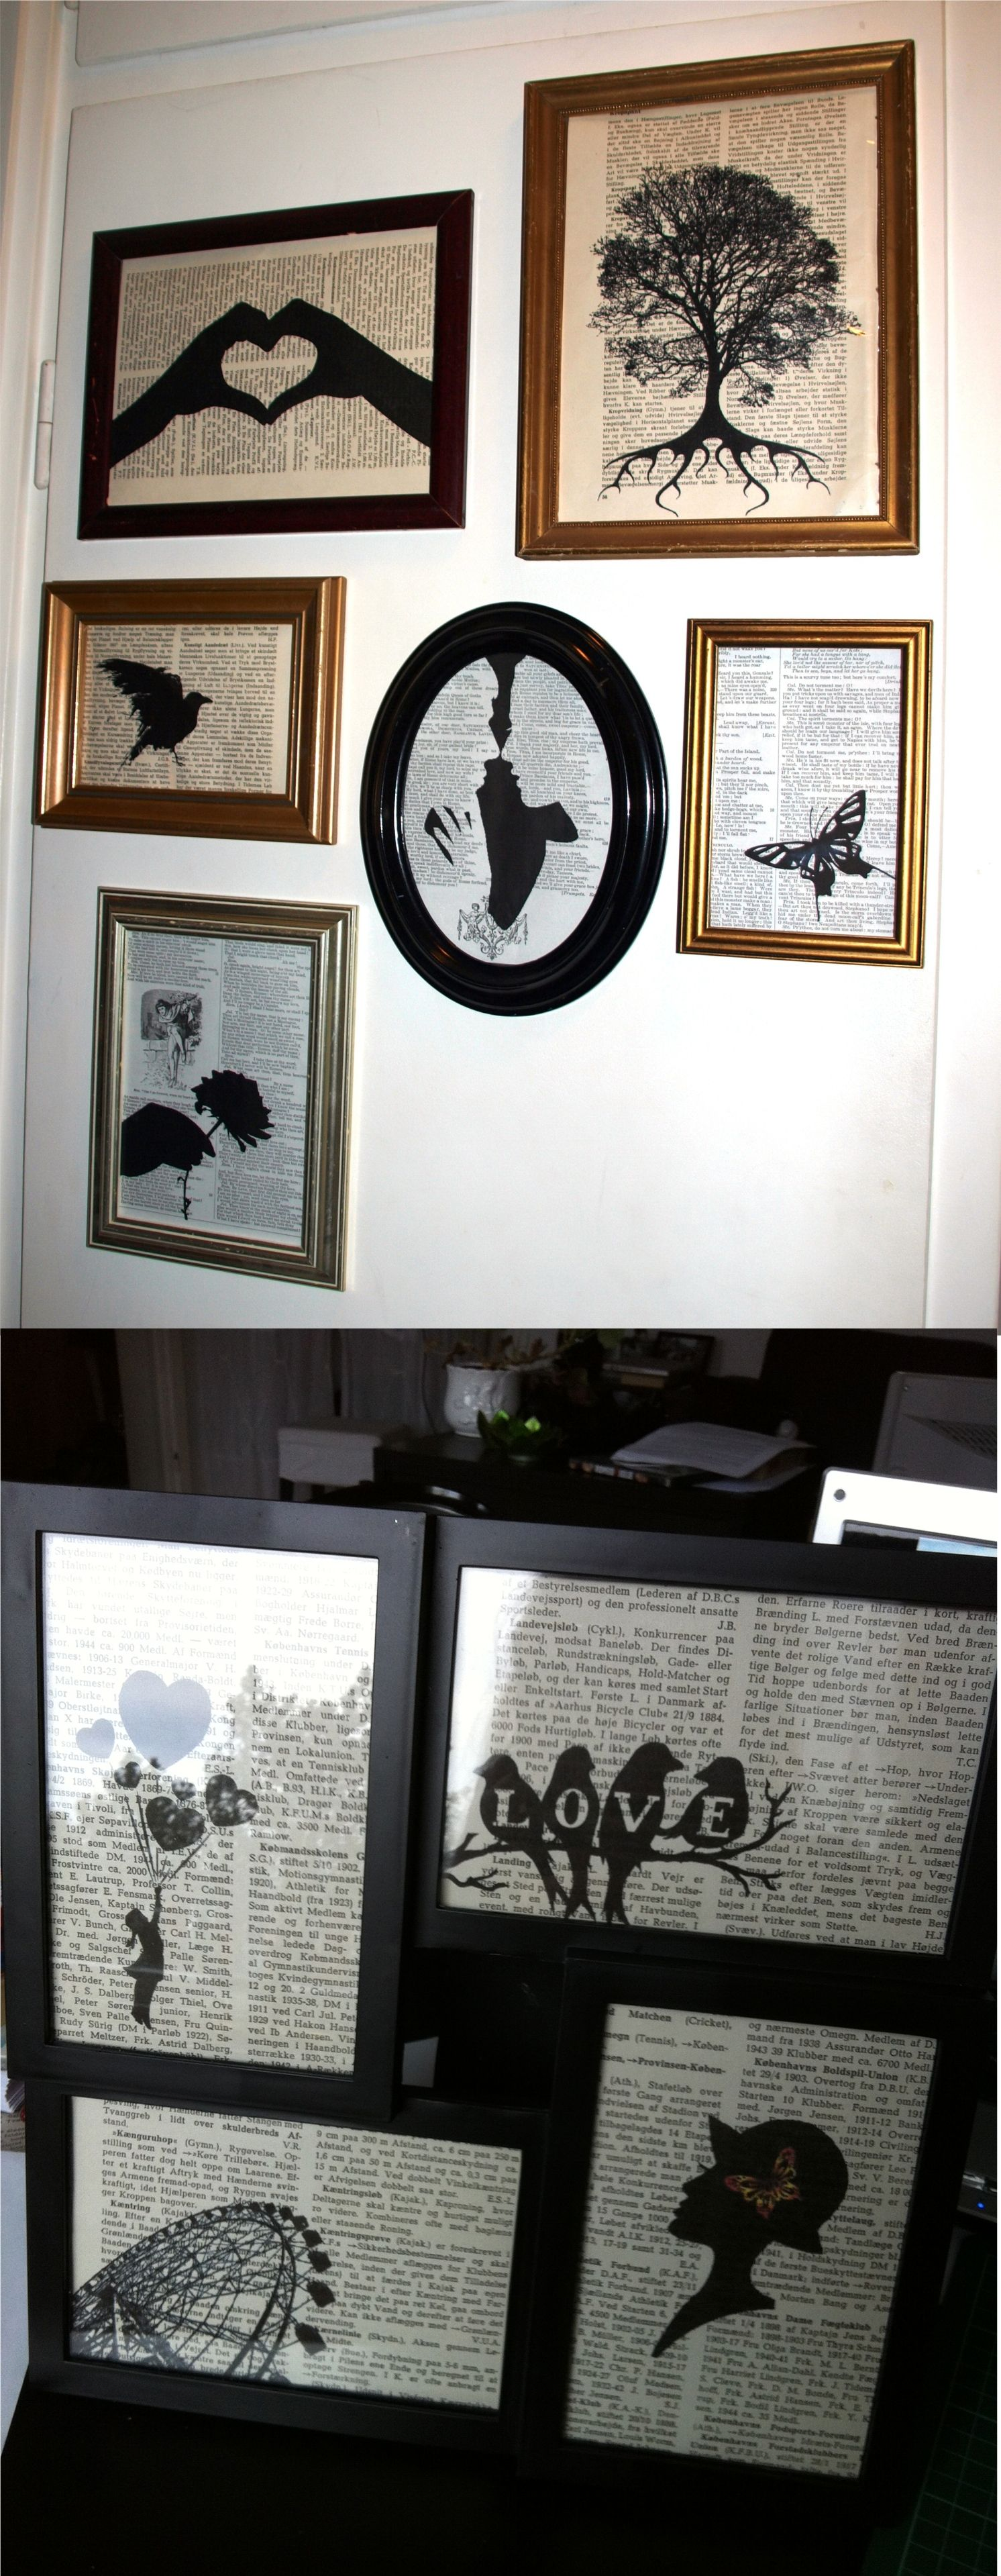 prints on old book pages - Prints On Old Book Pages